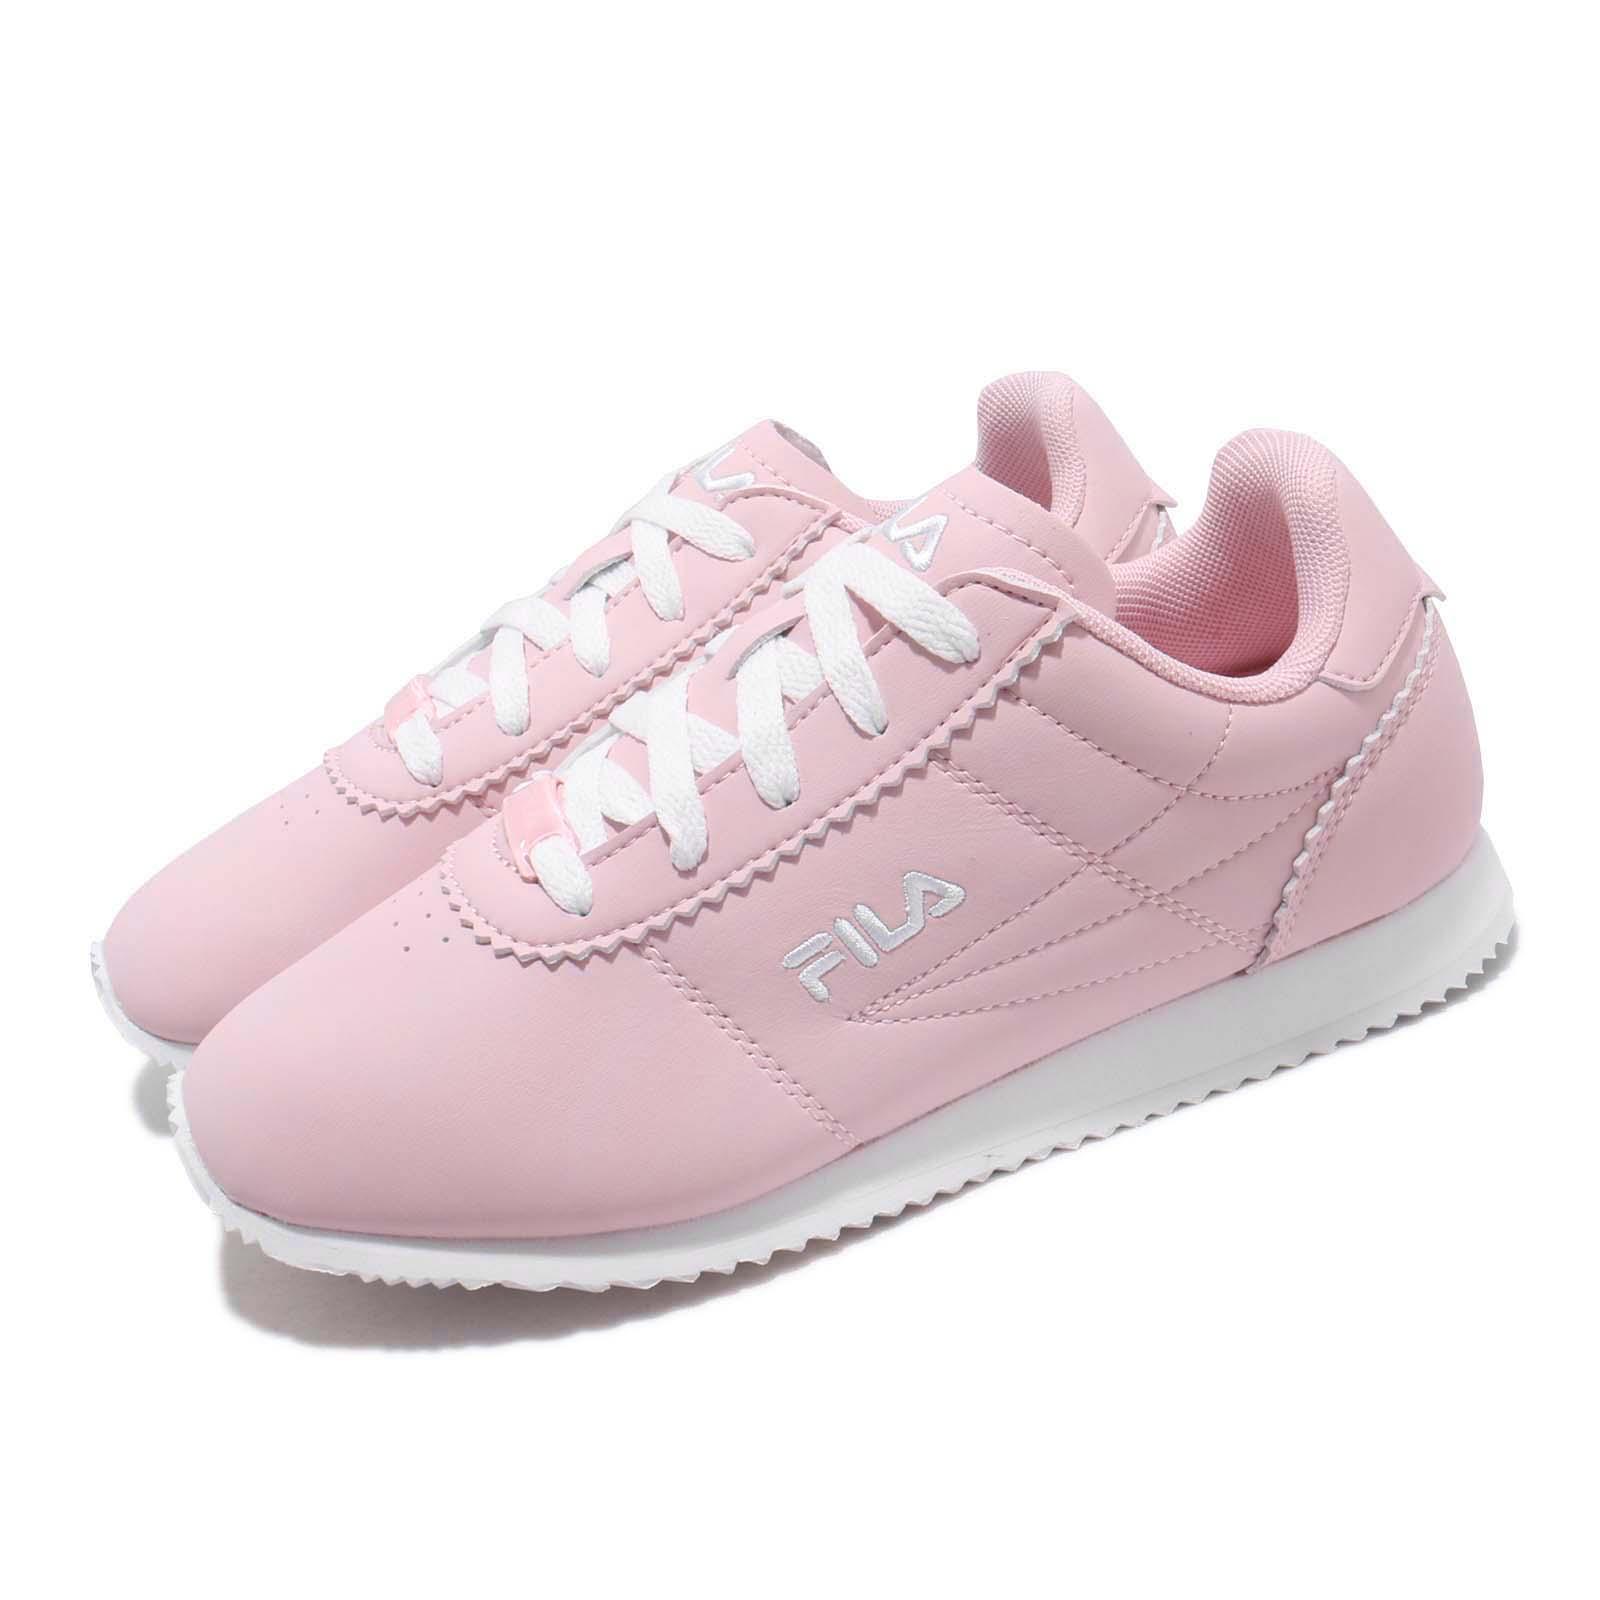 Fila 休閒鞋 5J903S551 低筒 運動 女鞋 5J903S551